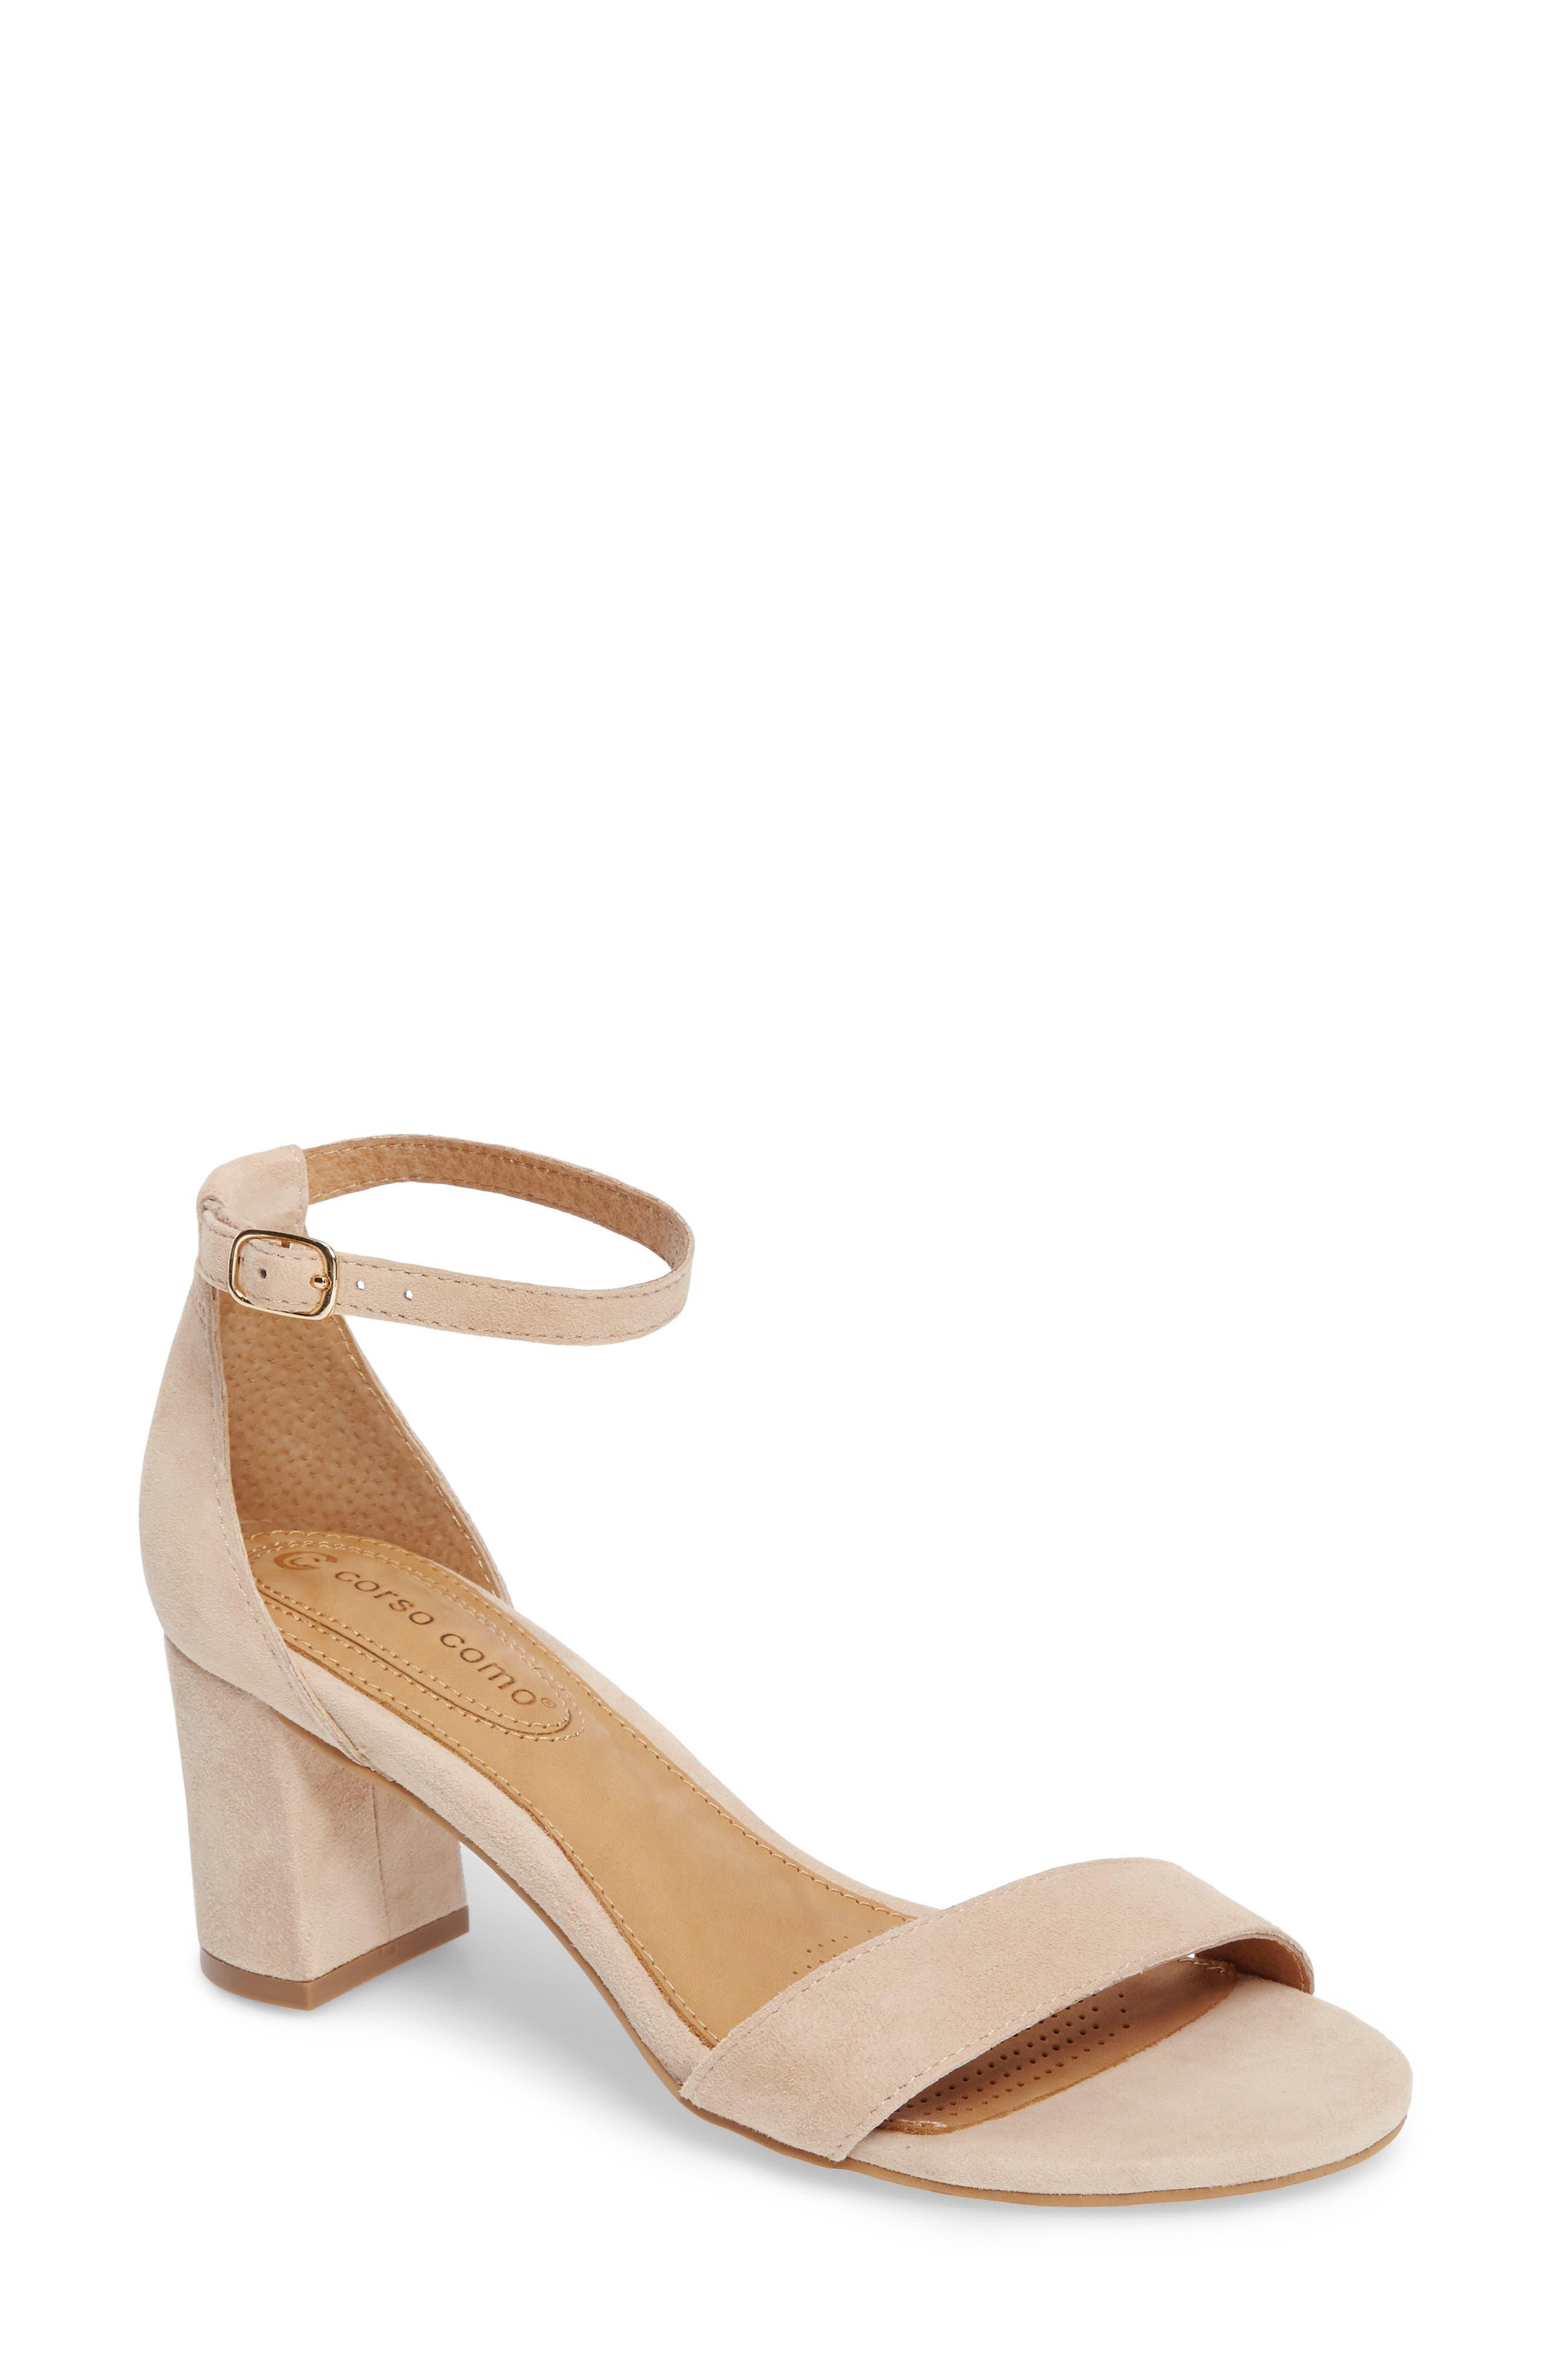 Alternate Image 1 Selected - Corso Como Caress Sandal (Women)